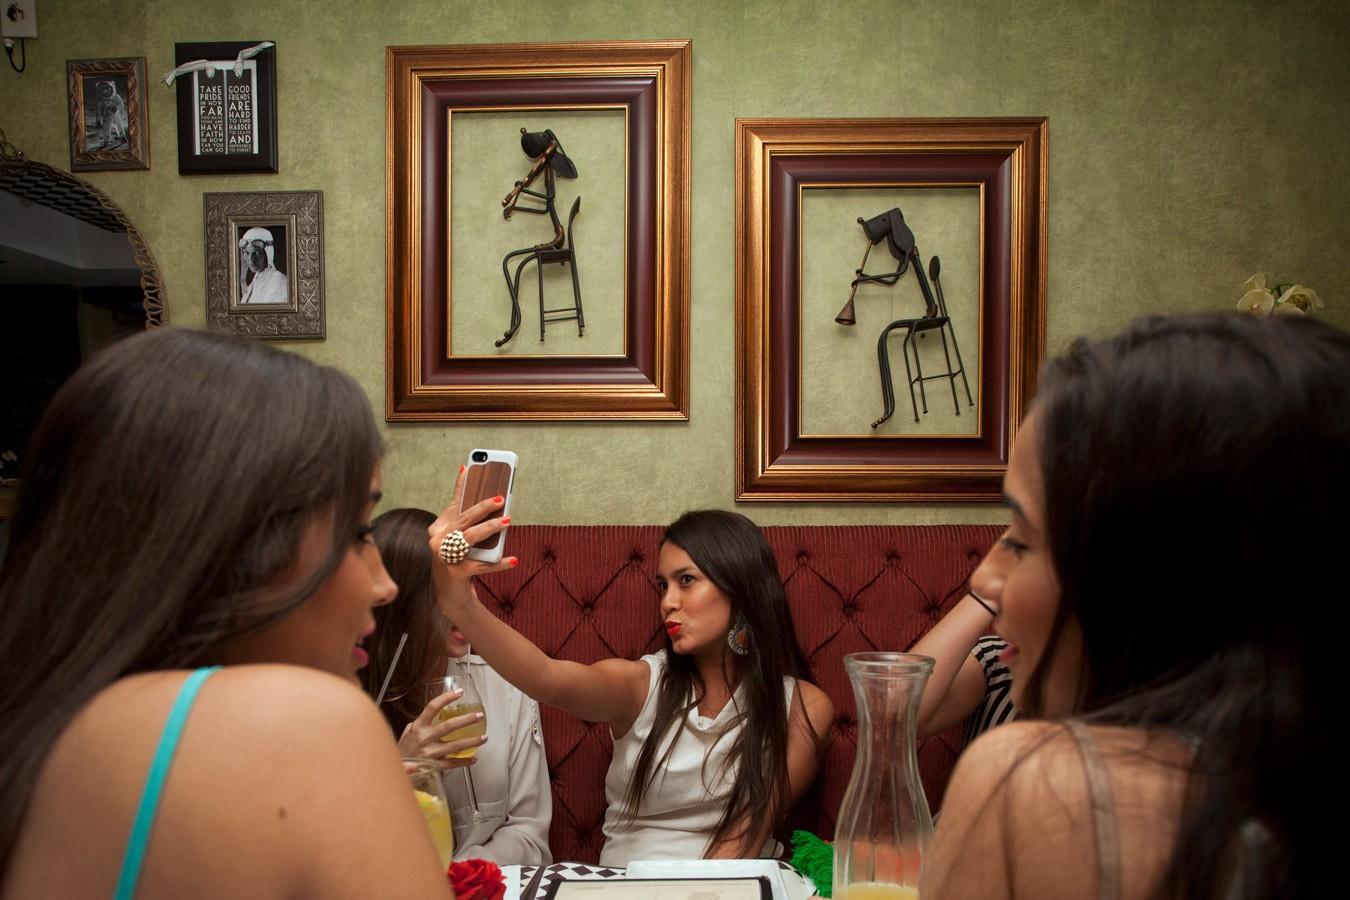 Girl taking a |  Joven haciéndose una    #selfie #havingagreattime #brunetteshavemorefun #girlsnightout #fridaynight #yolo #iwokeuplikethis #girlsnight #ladiesnightout #friendsforever #bffs #girlsjustwannahavefun #sangria #happyhour #lookingfabulous (2014)